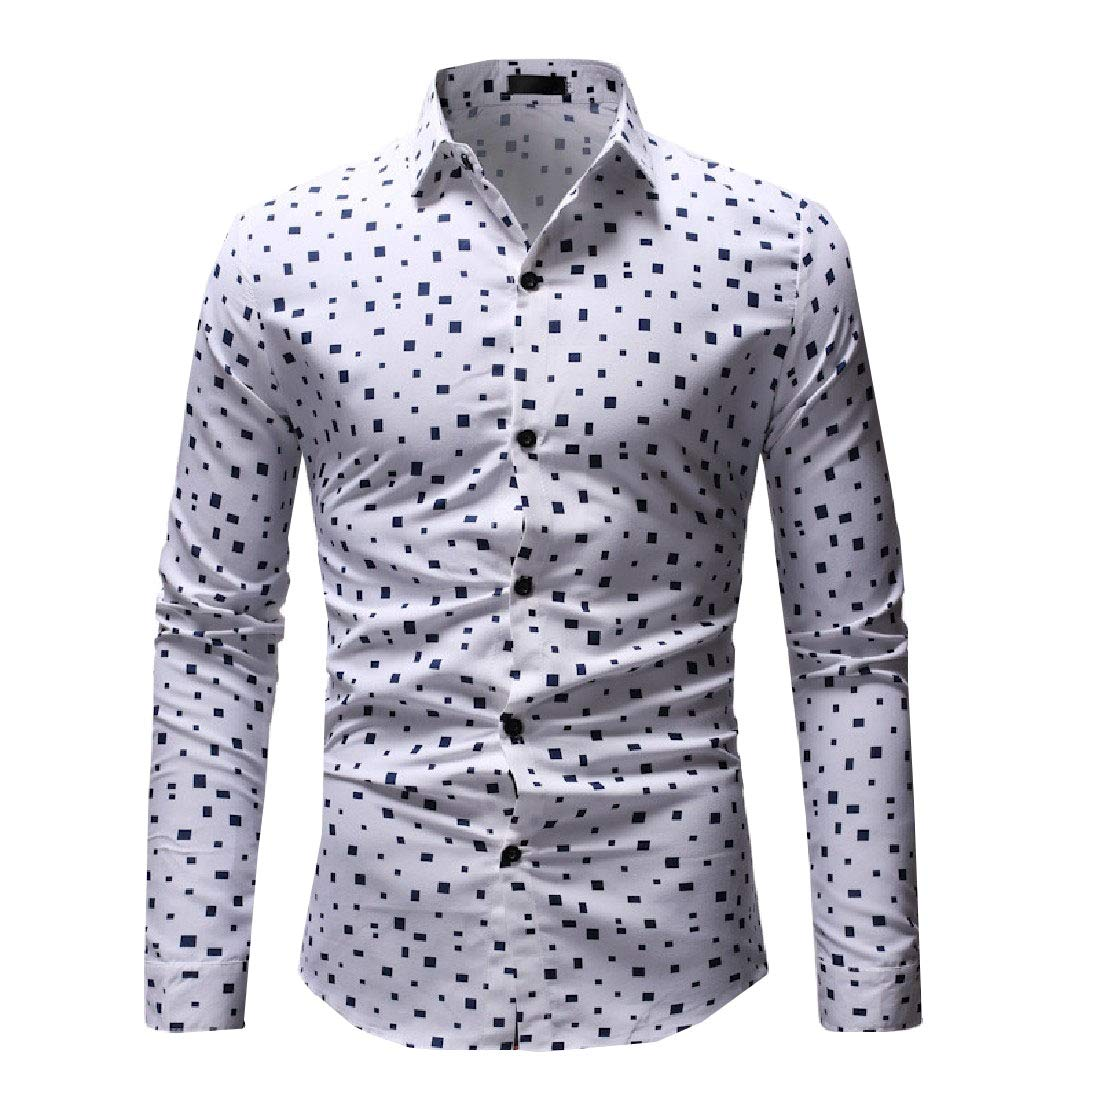 Ruhua Mens Long Sleeve Print Fold-Collar Buttoned Basic Style Western Shirt